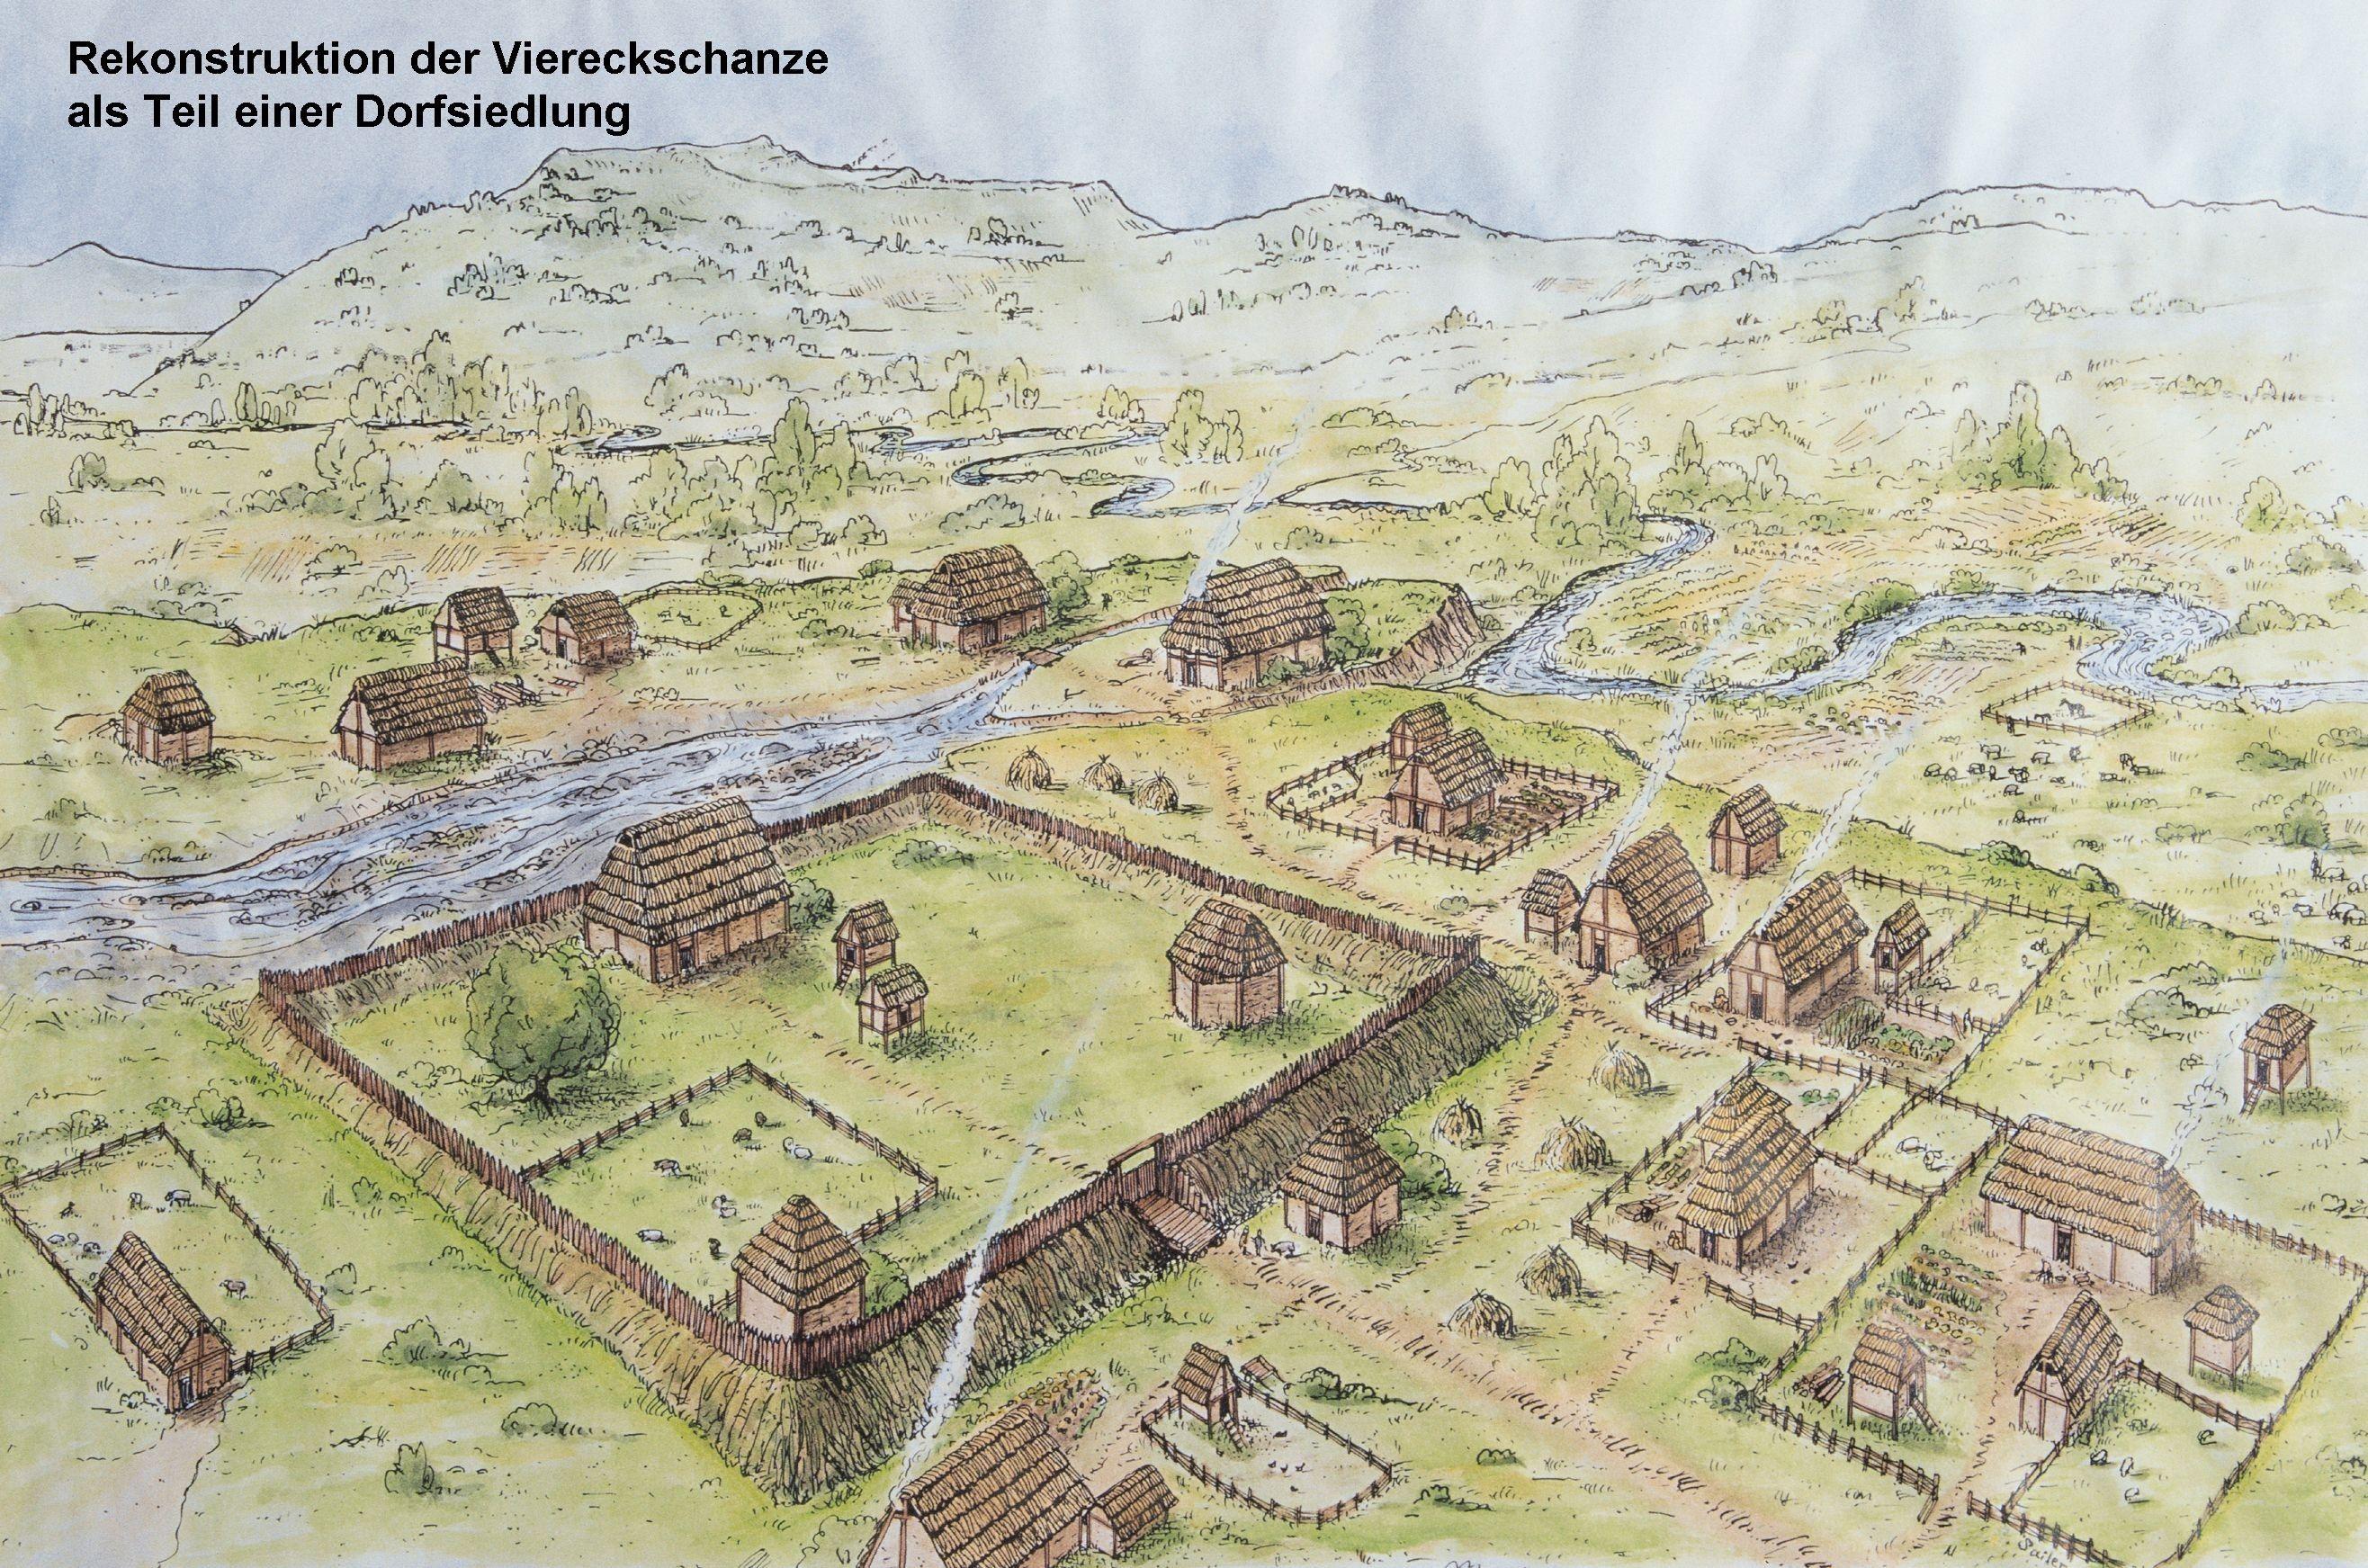 Viereckschanze in Bopfingen Flochberg eastern Baden Wrttemberg 2nd 1st